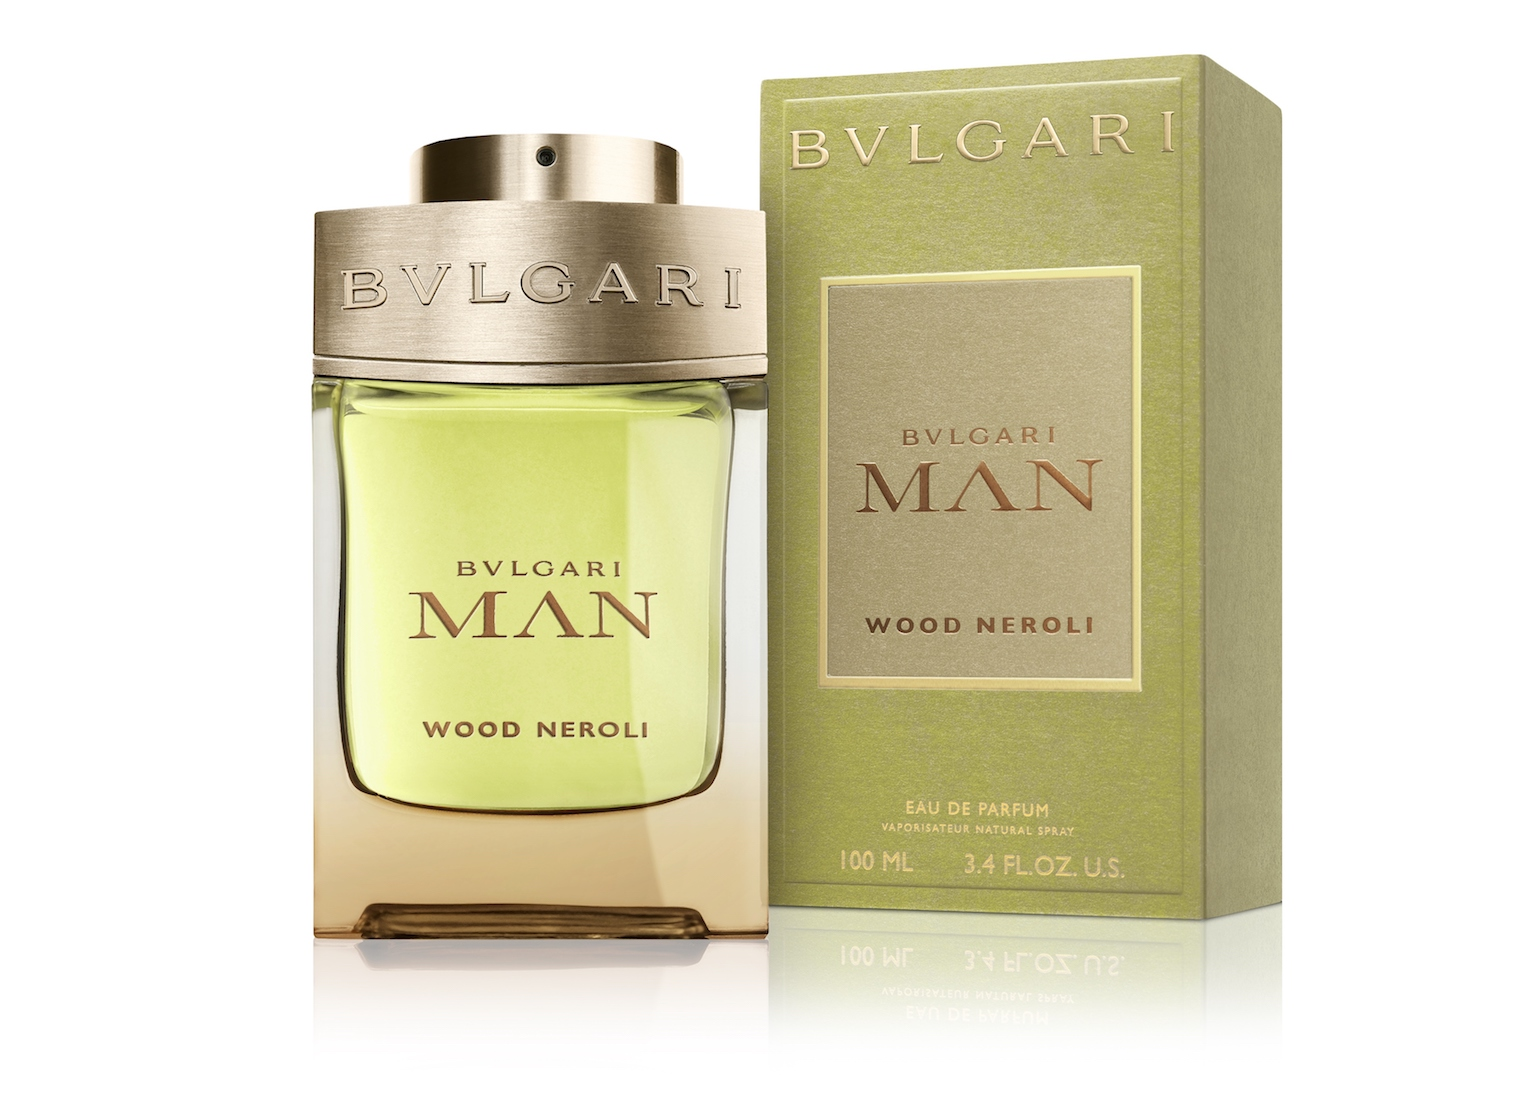 Bvlgari Man Wood Neroli: best Bvlgari male fragrance ever